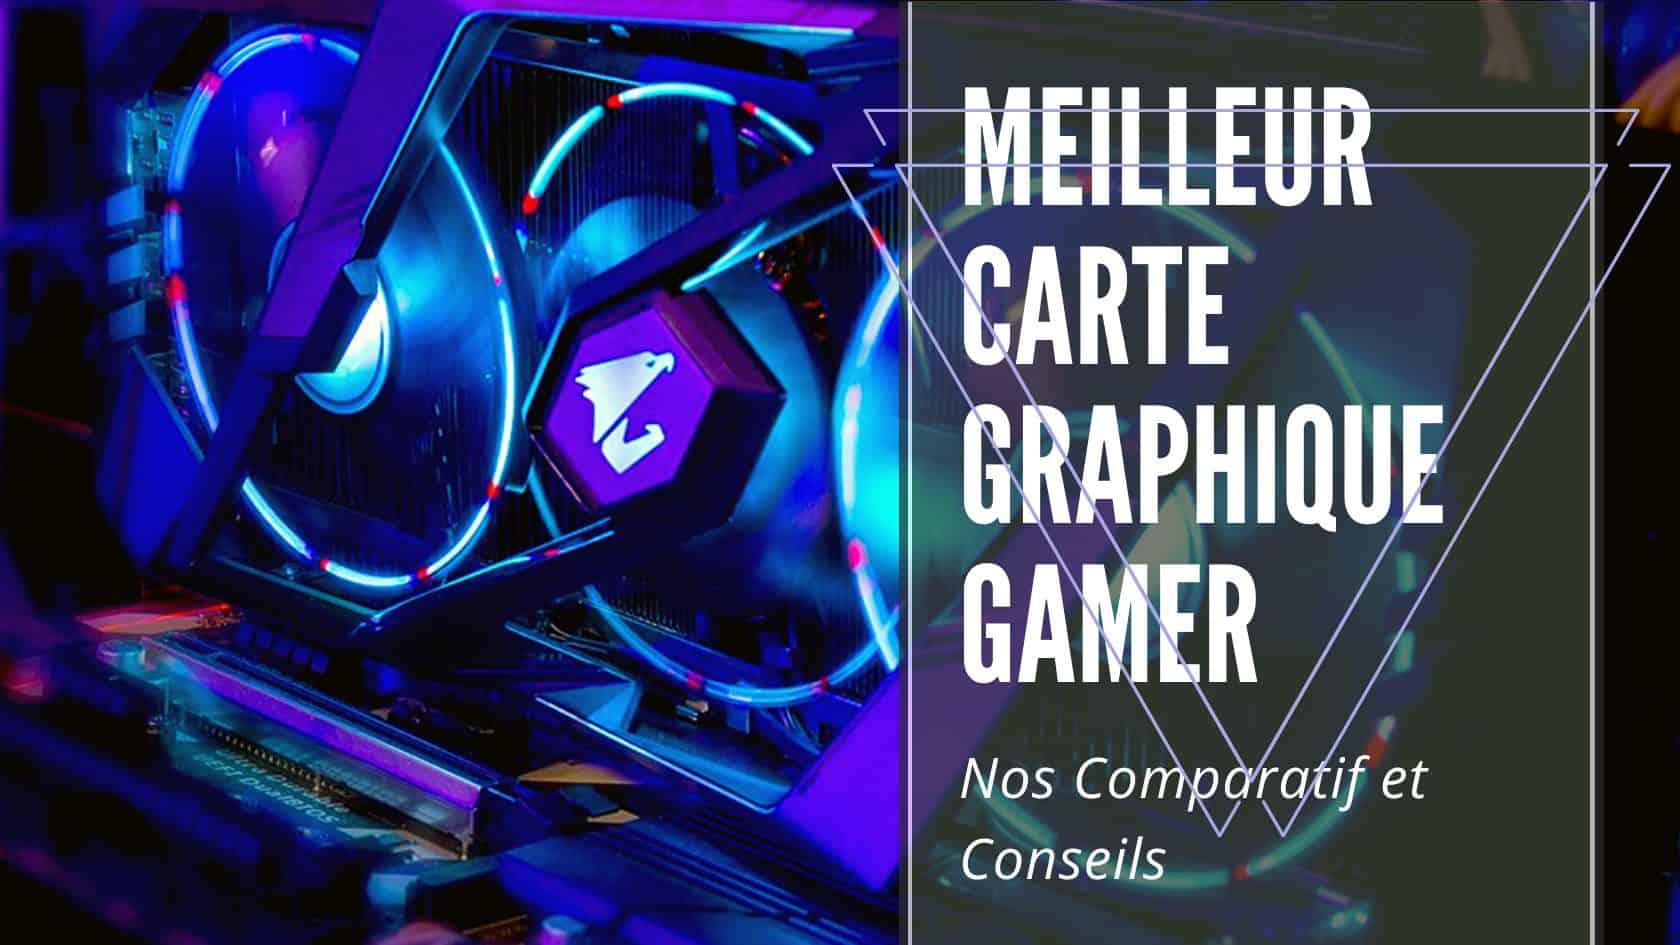 Meilleur Carte Graphique Gamer